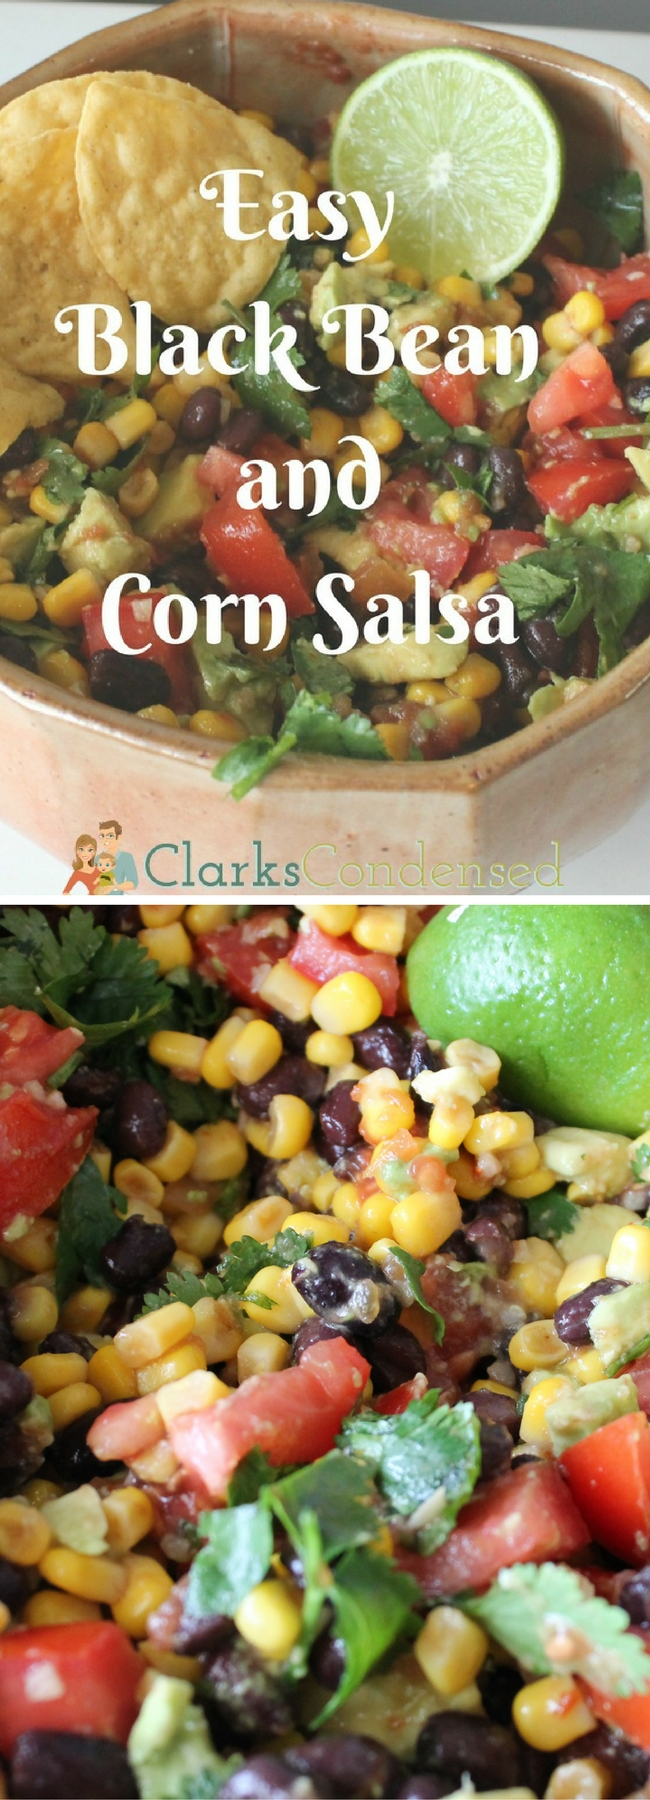 Easy Black Bean and Corn Salsa via @clarkscondensed